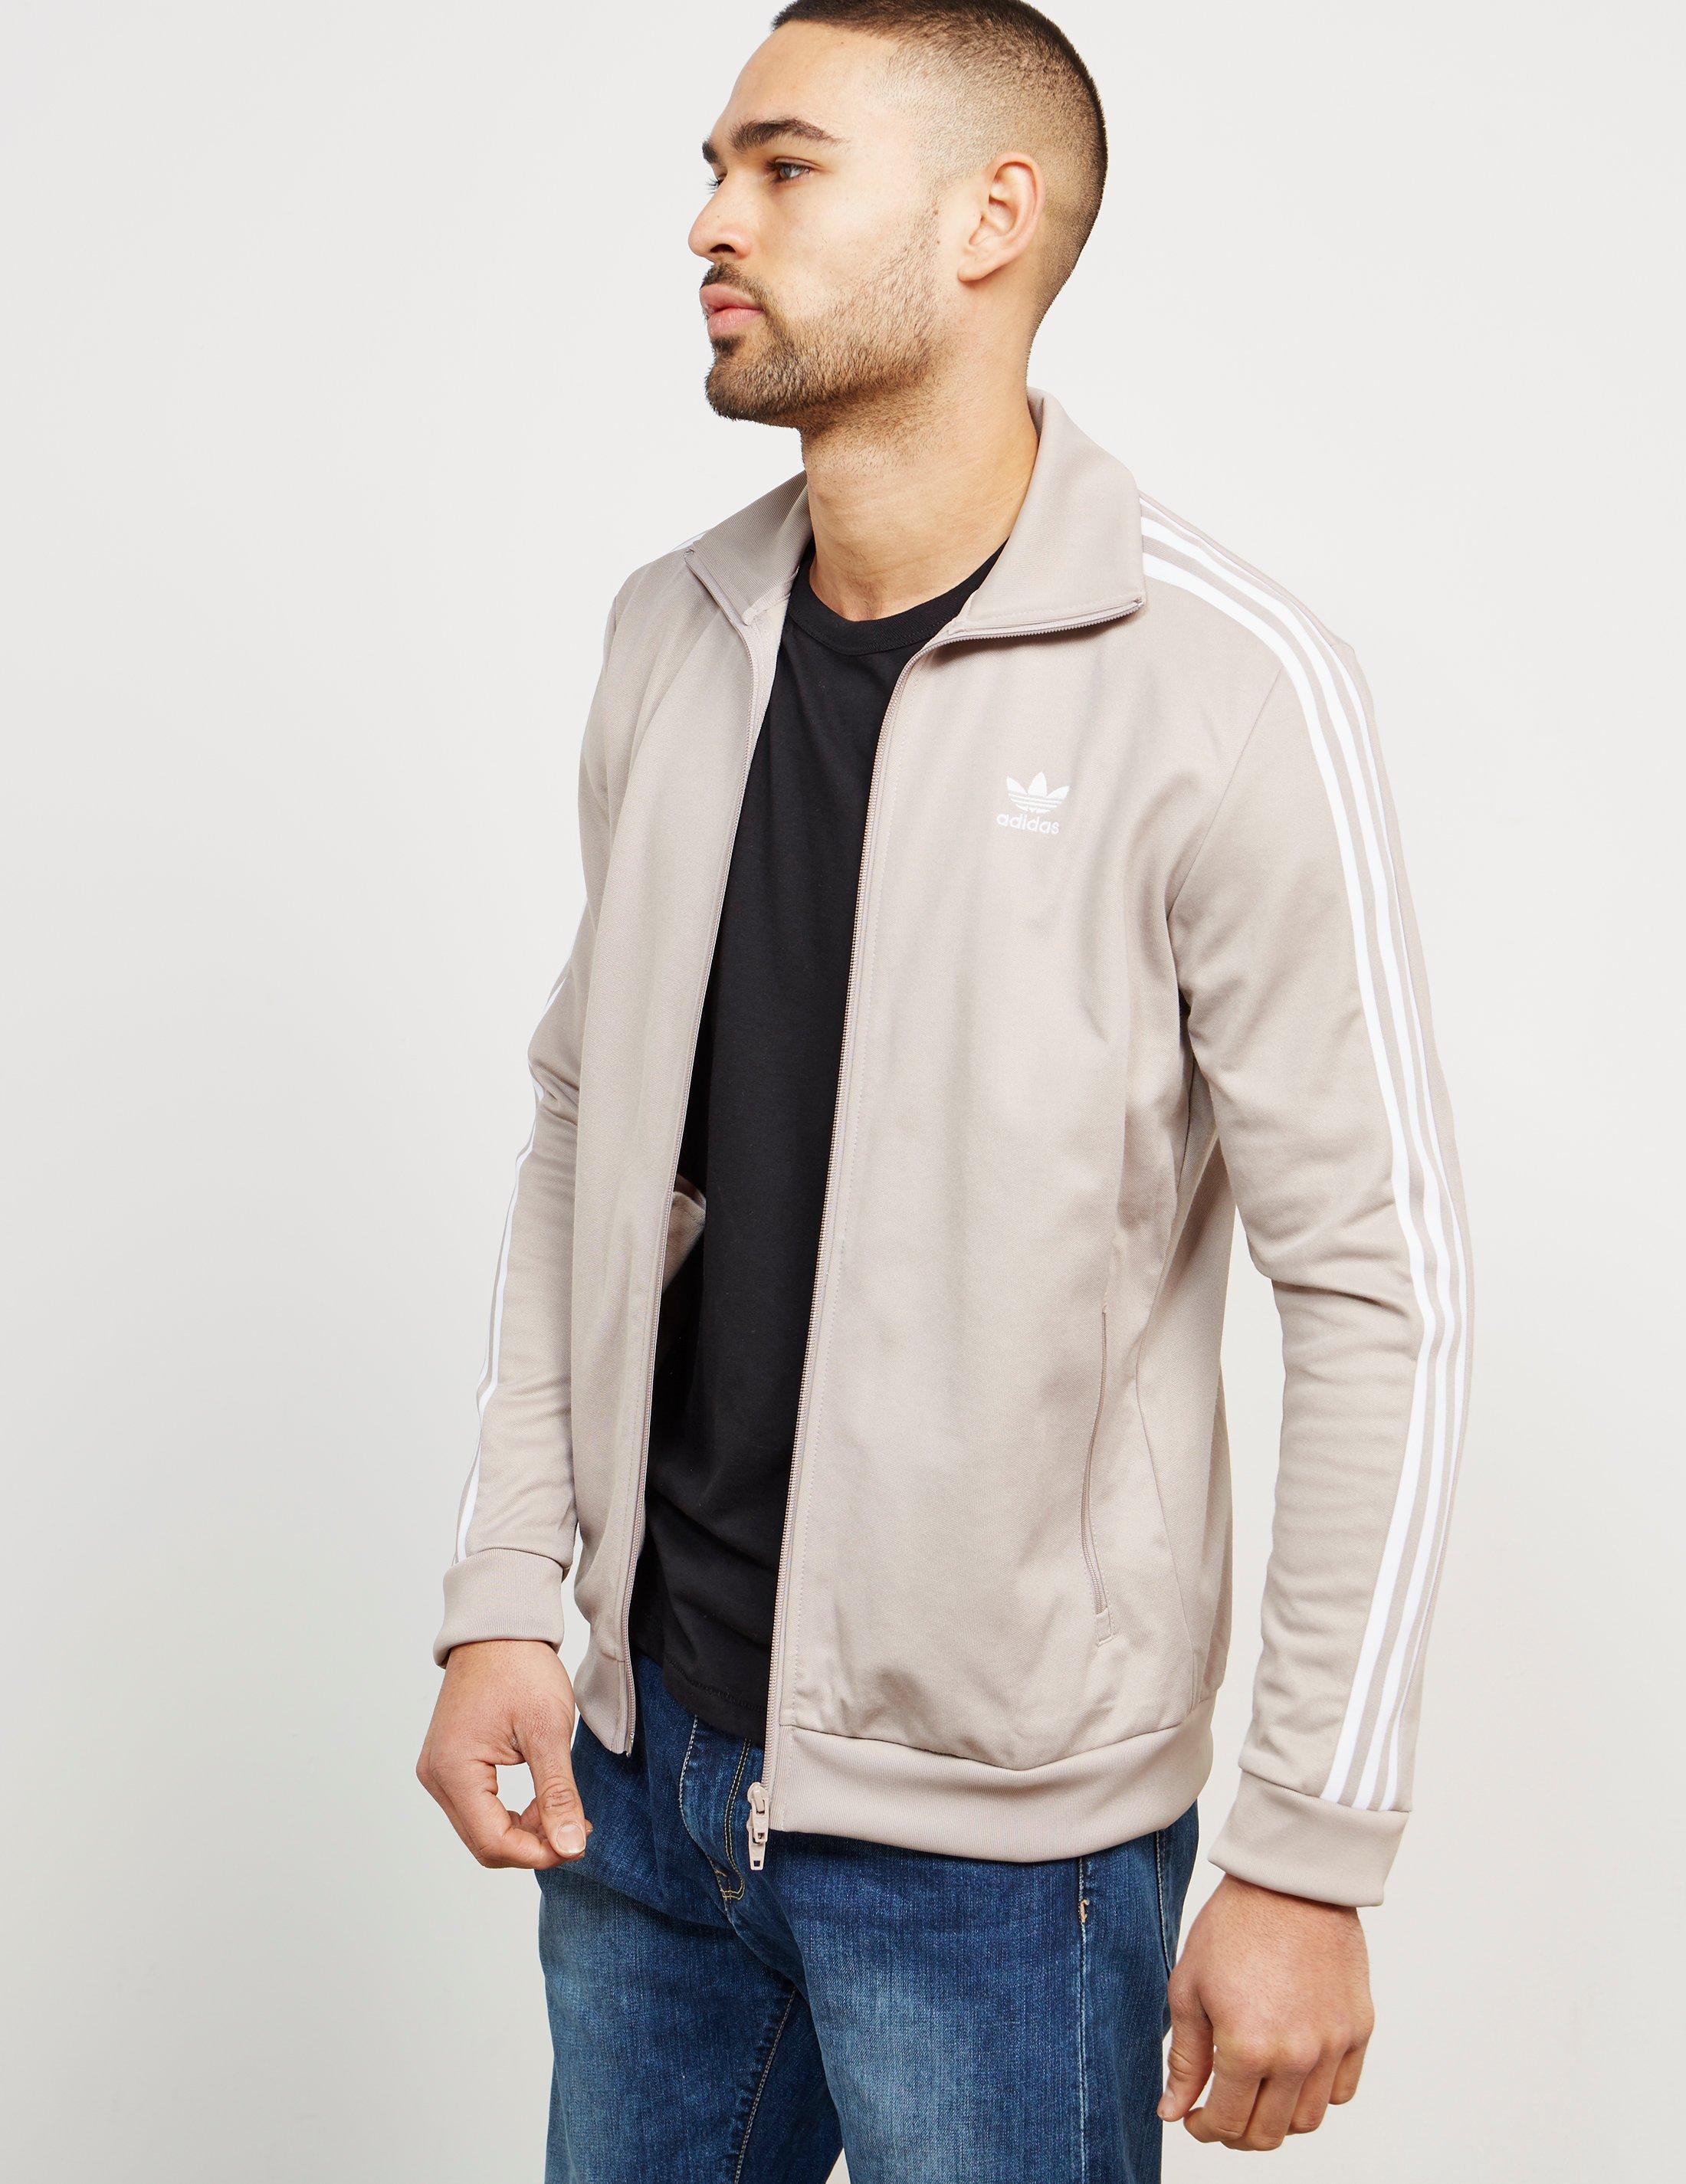 f96cbc93aba adidas Originals Mens Beckenbauer Full Zip Track Top Grey in Gray ...